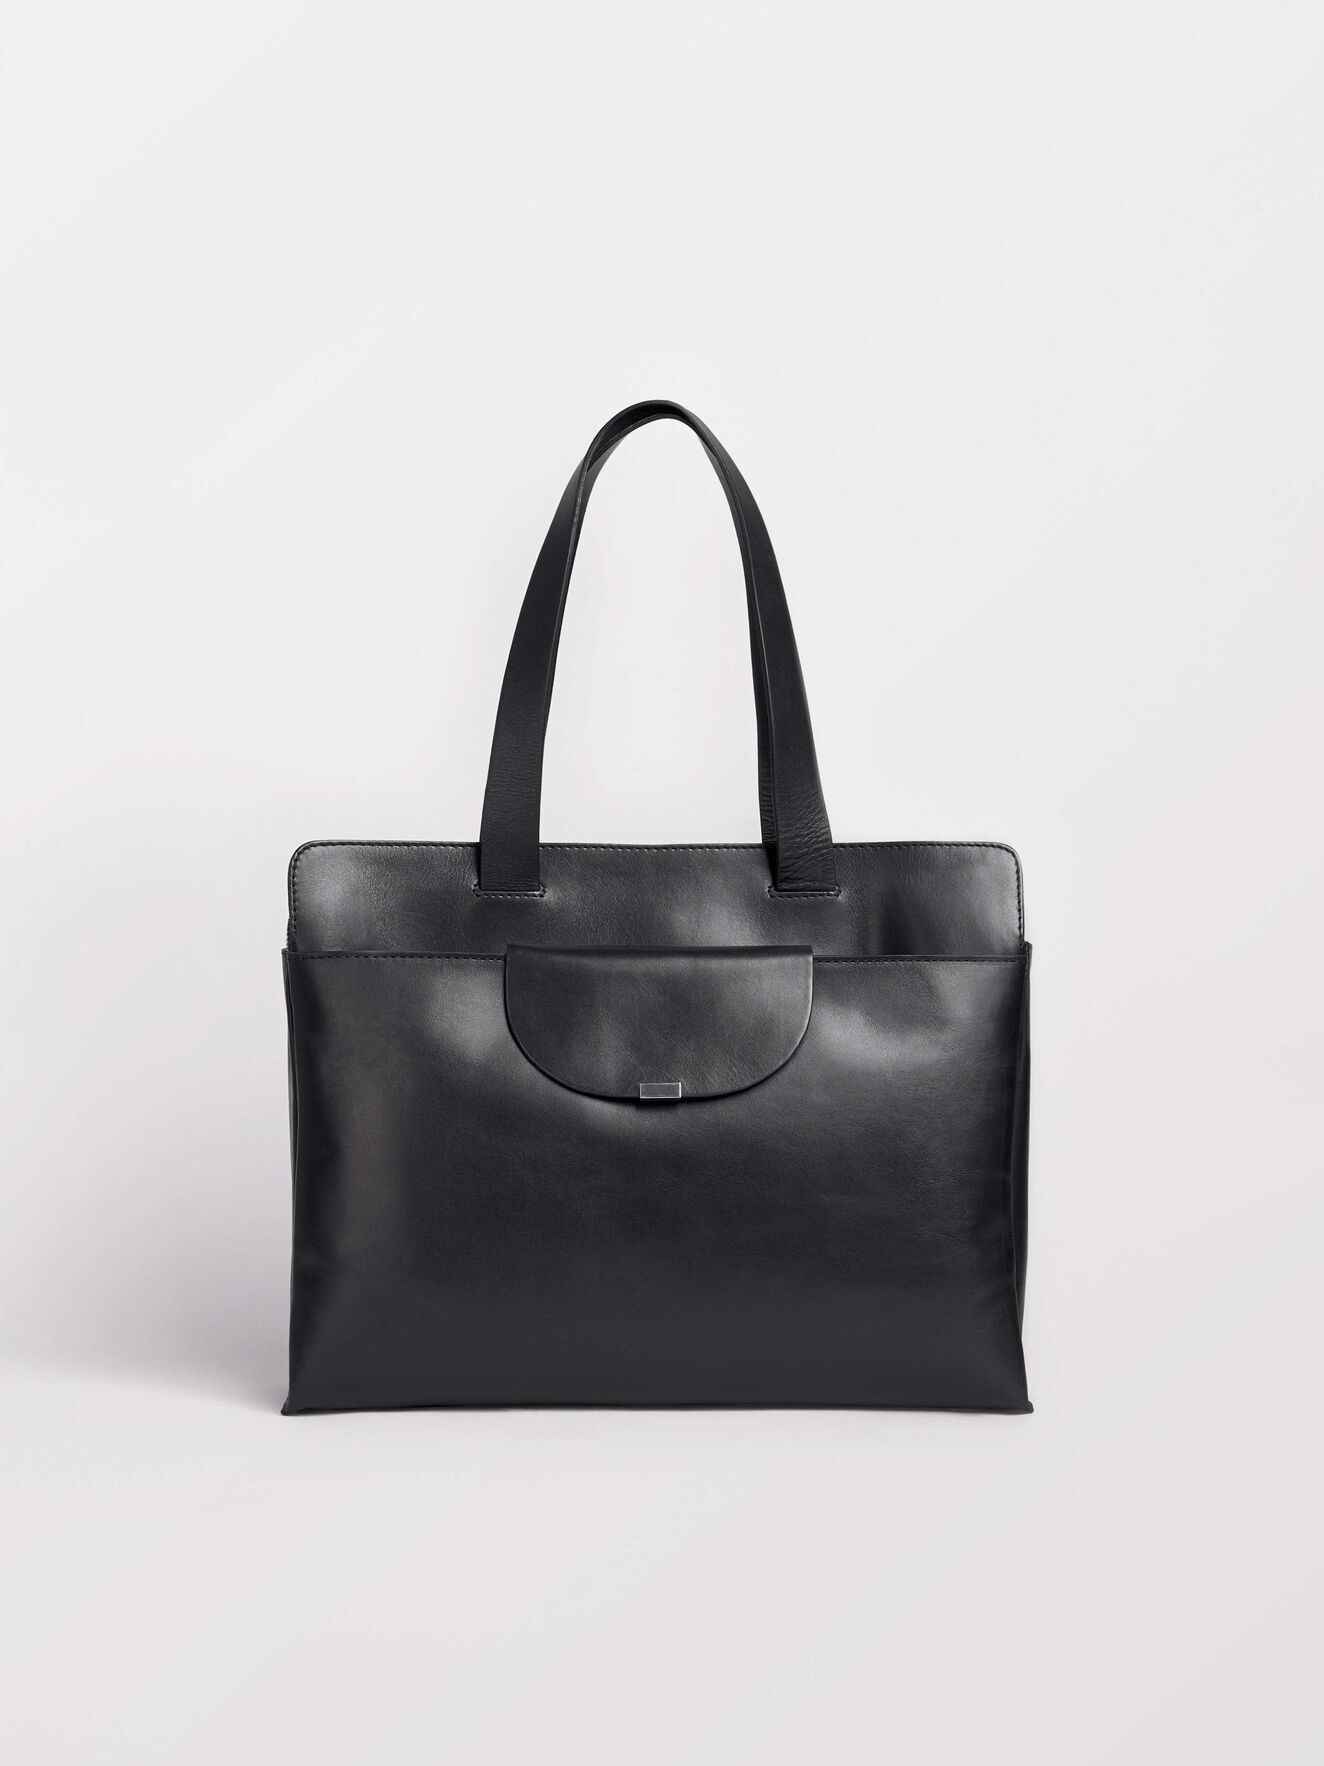 Edita Work Bag in Black from Tiger of Sweden